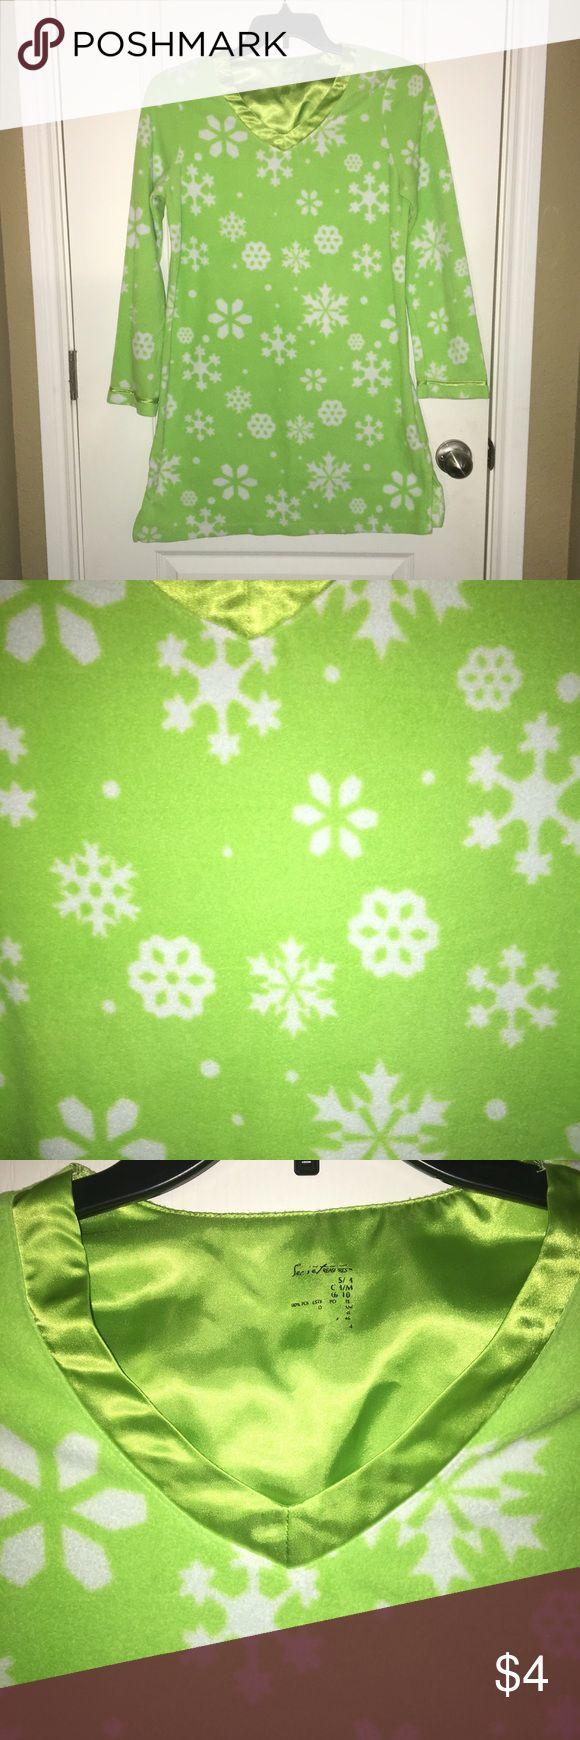 Christmas pajamas Green fleece Christmas nightgown with white snowflakes, super cute for Christmas! Missoni for Target Intimates & Sleepwear Pajamas